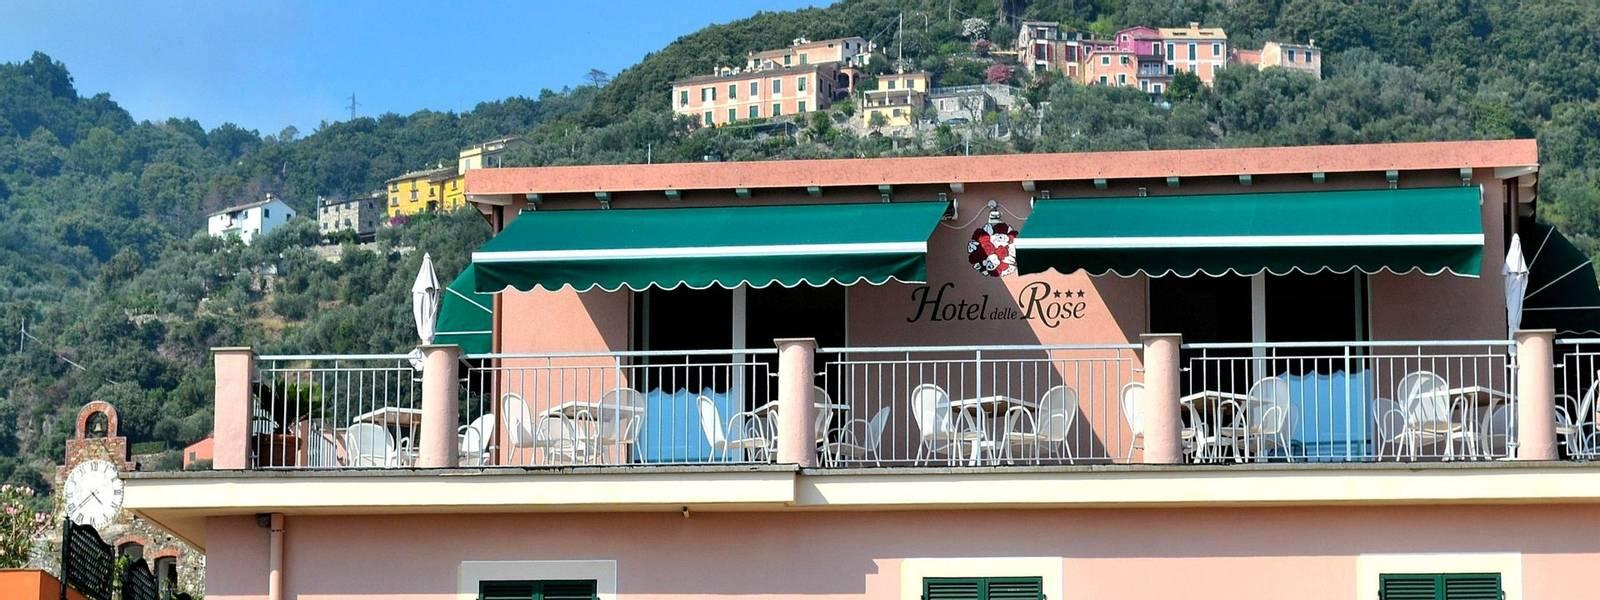 Italy - Cinque Terre -Hotel Delle Rose - DSC_0015 bis.JPG